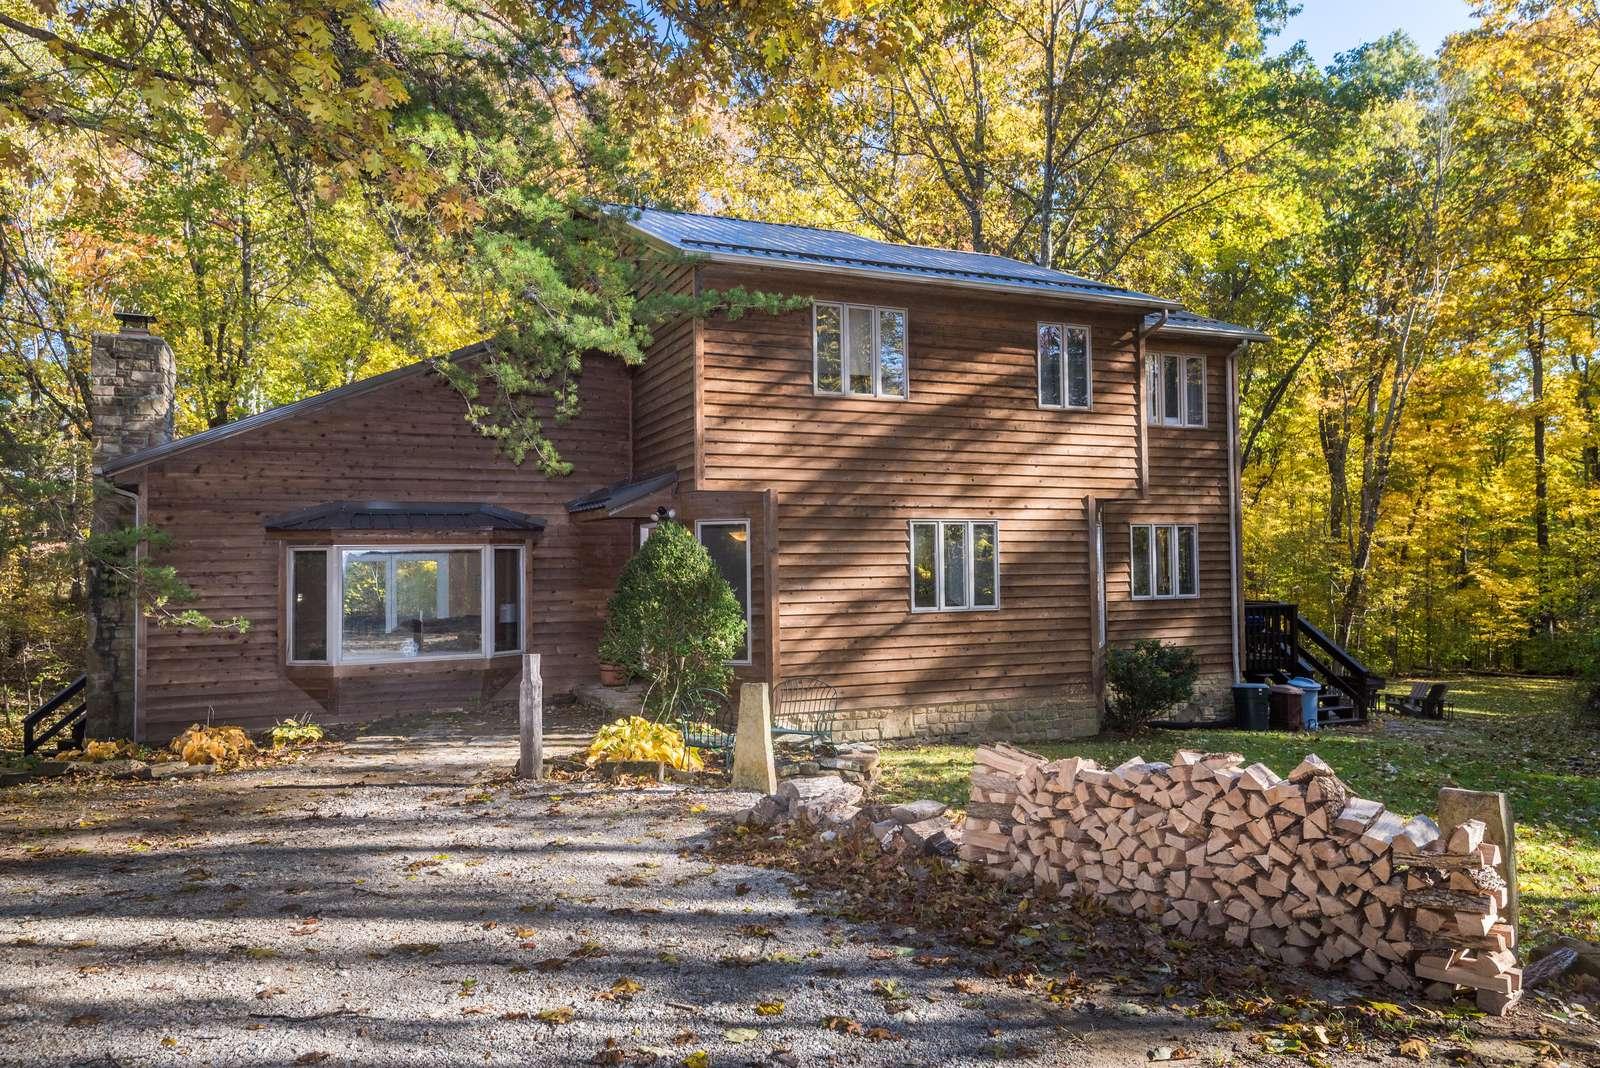 The Ridge Vacation Cabin - property